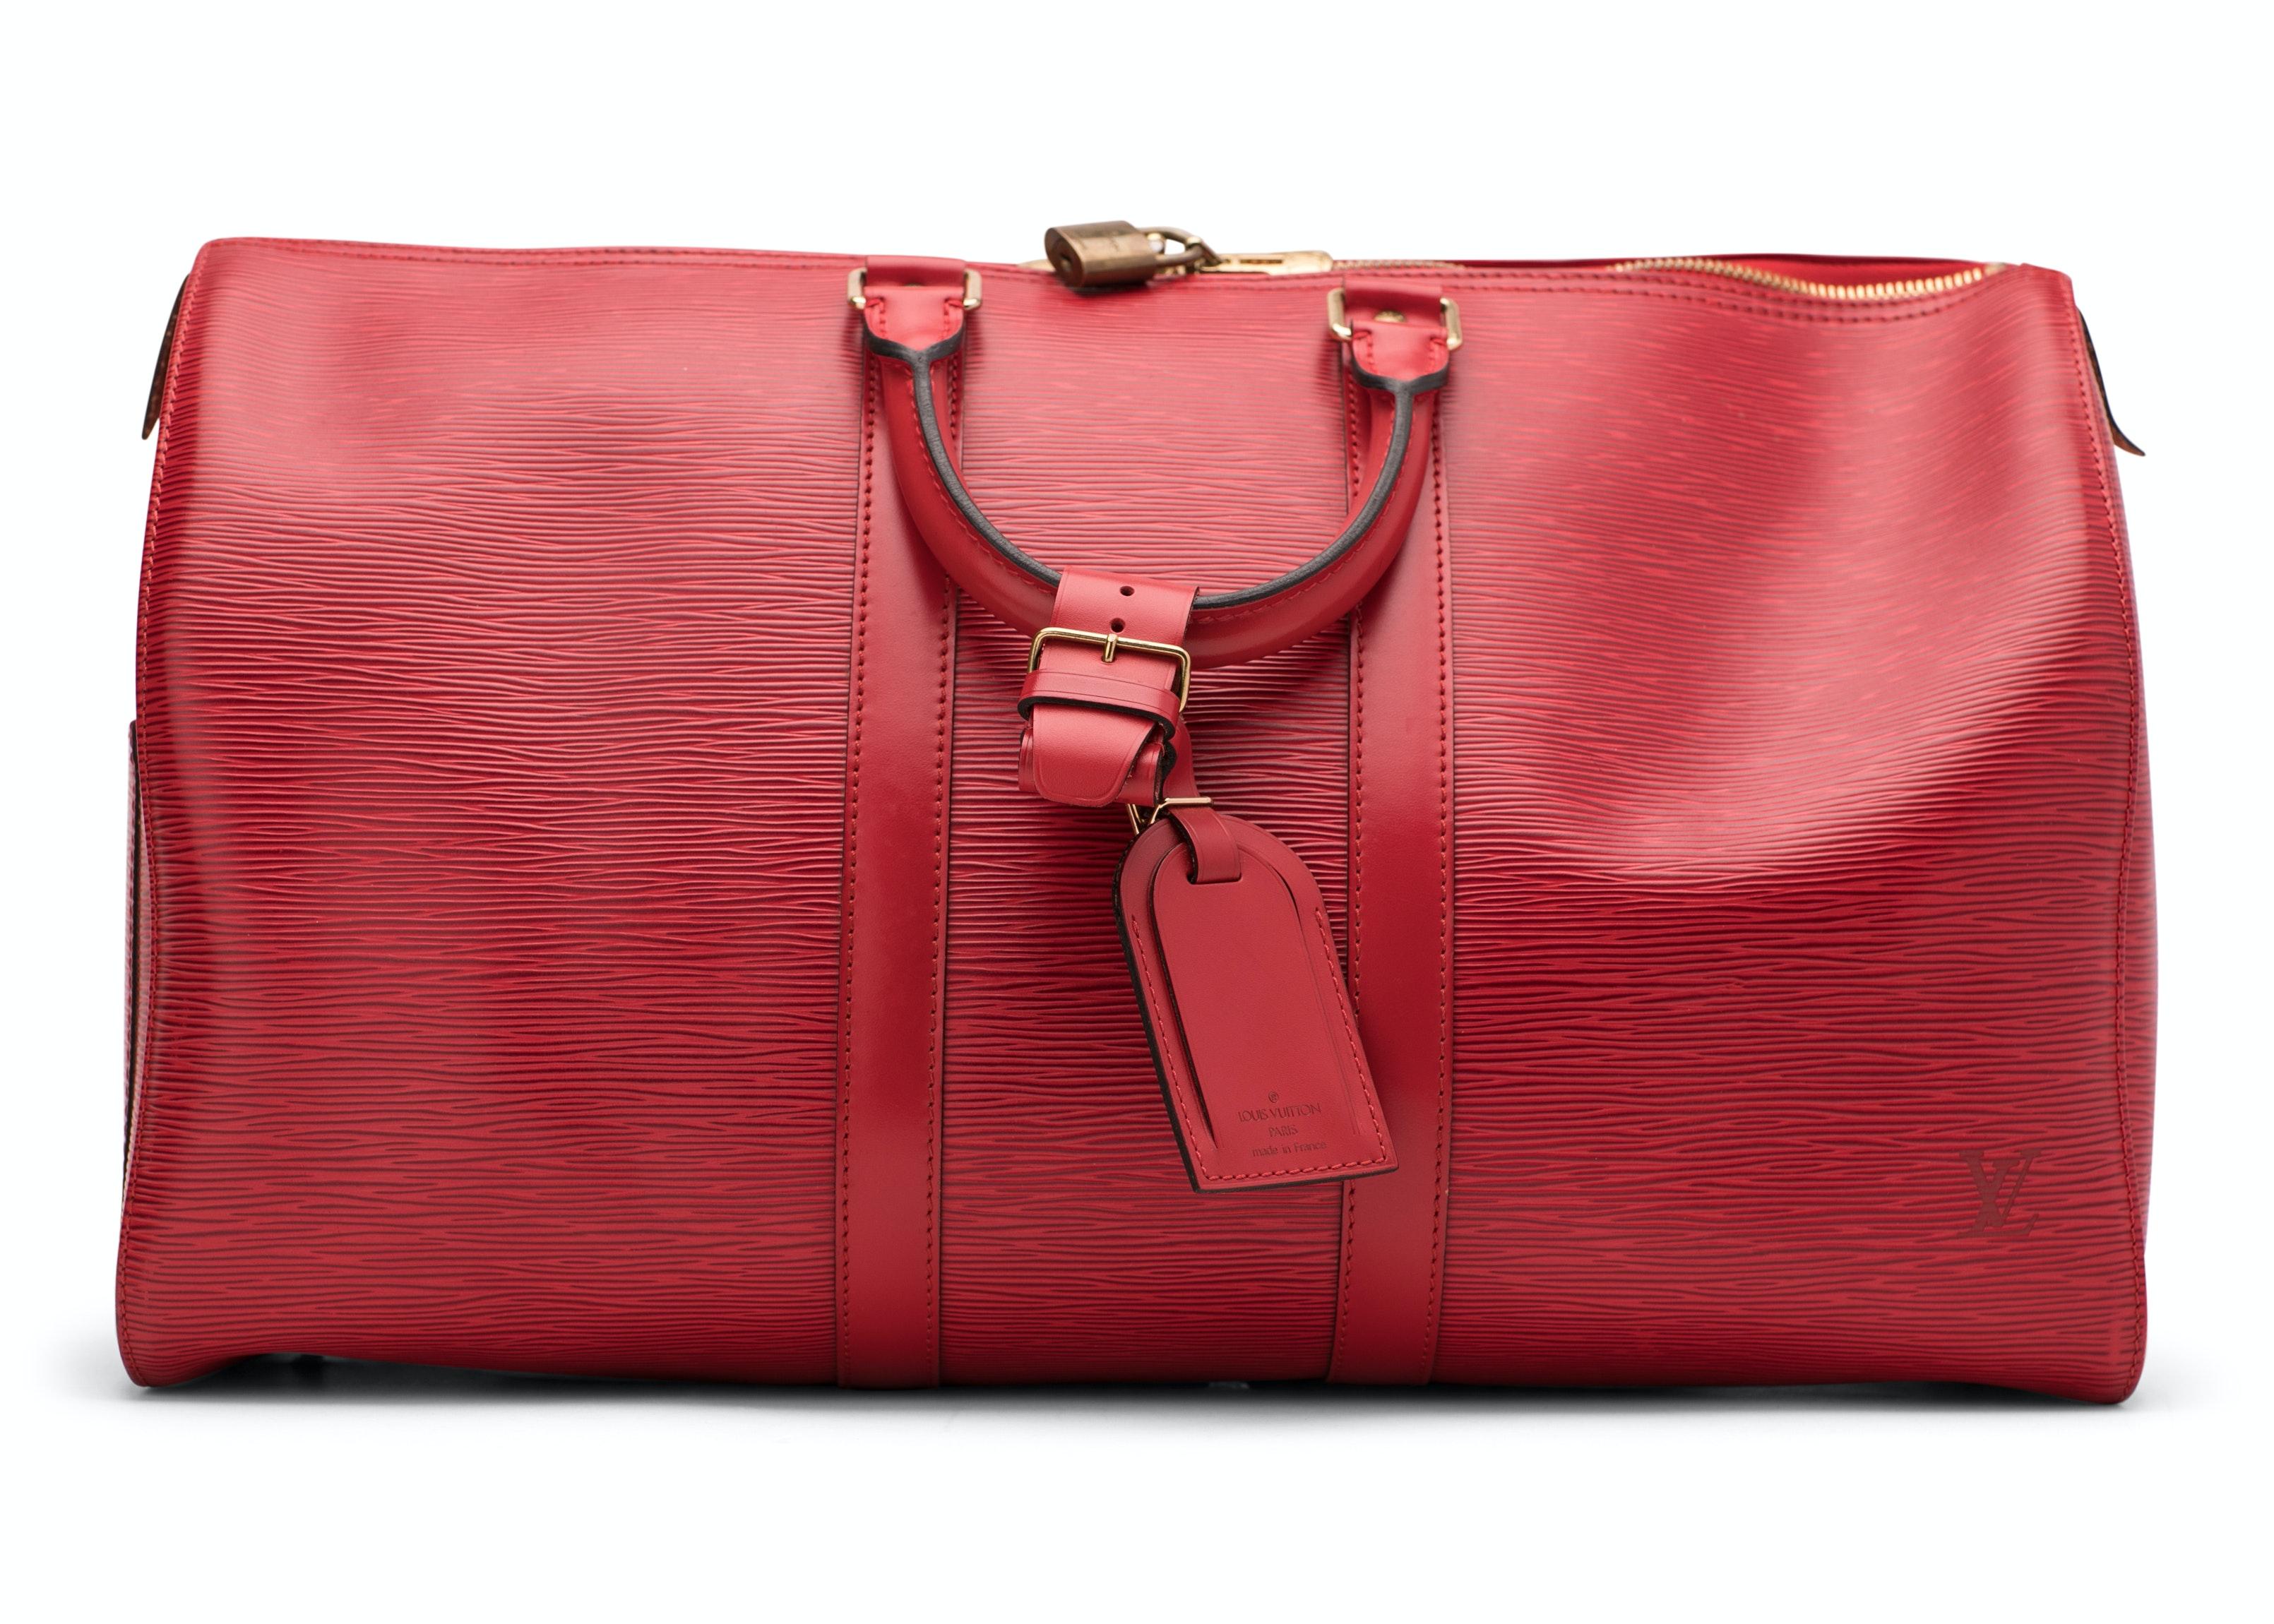 Louis Vuitton Keepall Epi 50 Red